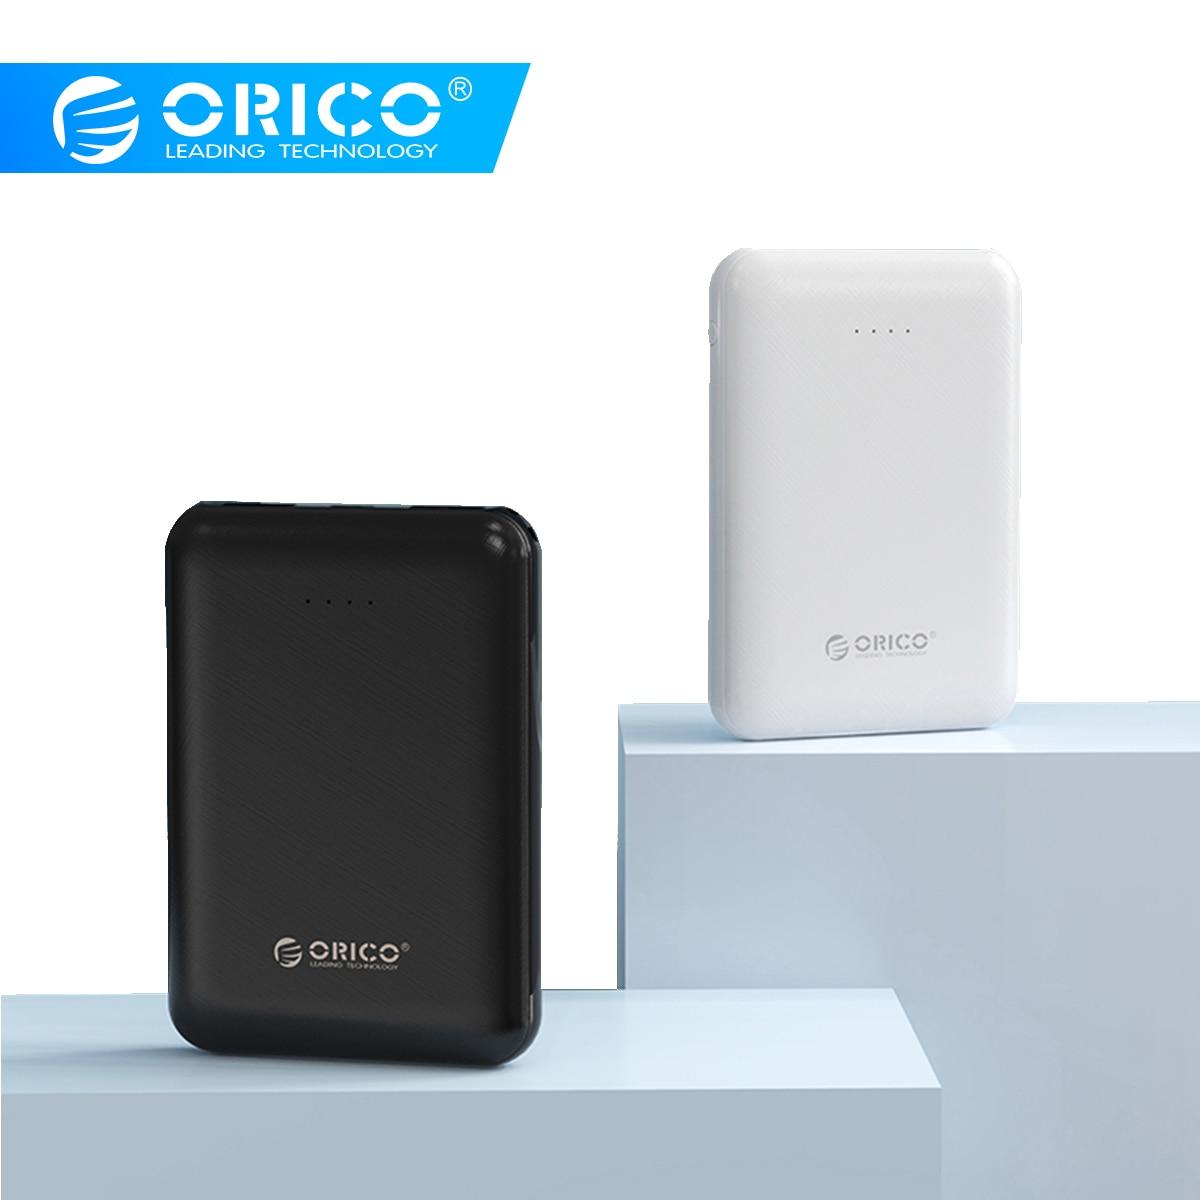 ORICO Mini Slim Power Bank 5000mAh Portable External Battery Mobile Powerbank USB Charging Poverbank For iphone Xiaomi Mi Bank|Power Bank| |  - title=